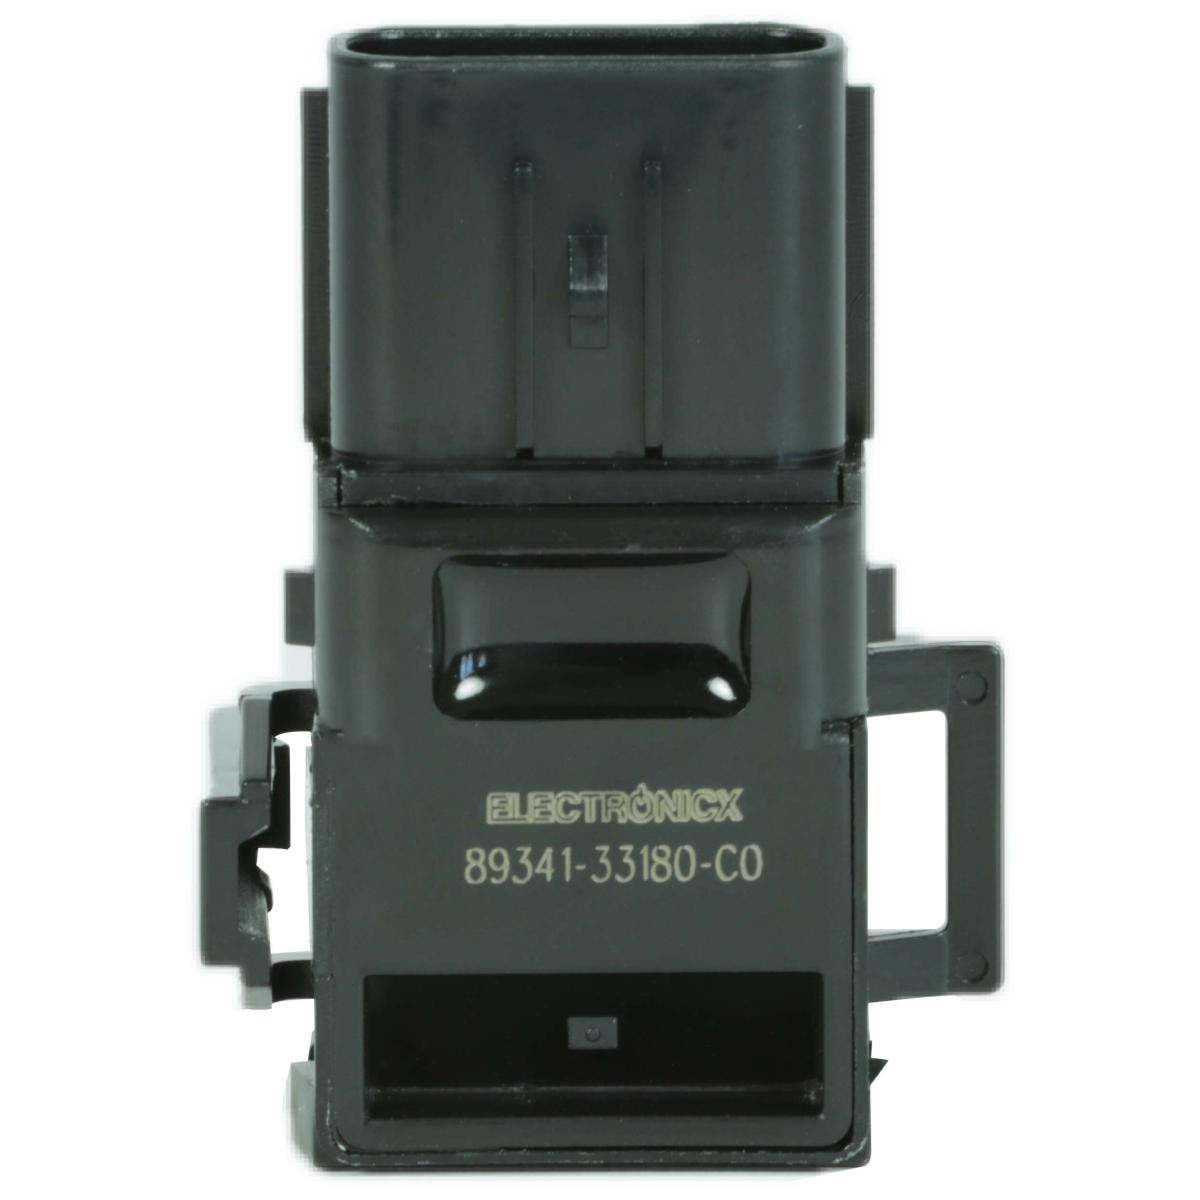 Park sensor 89341-33180 for Toyota PDC Parktronic